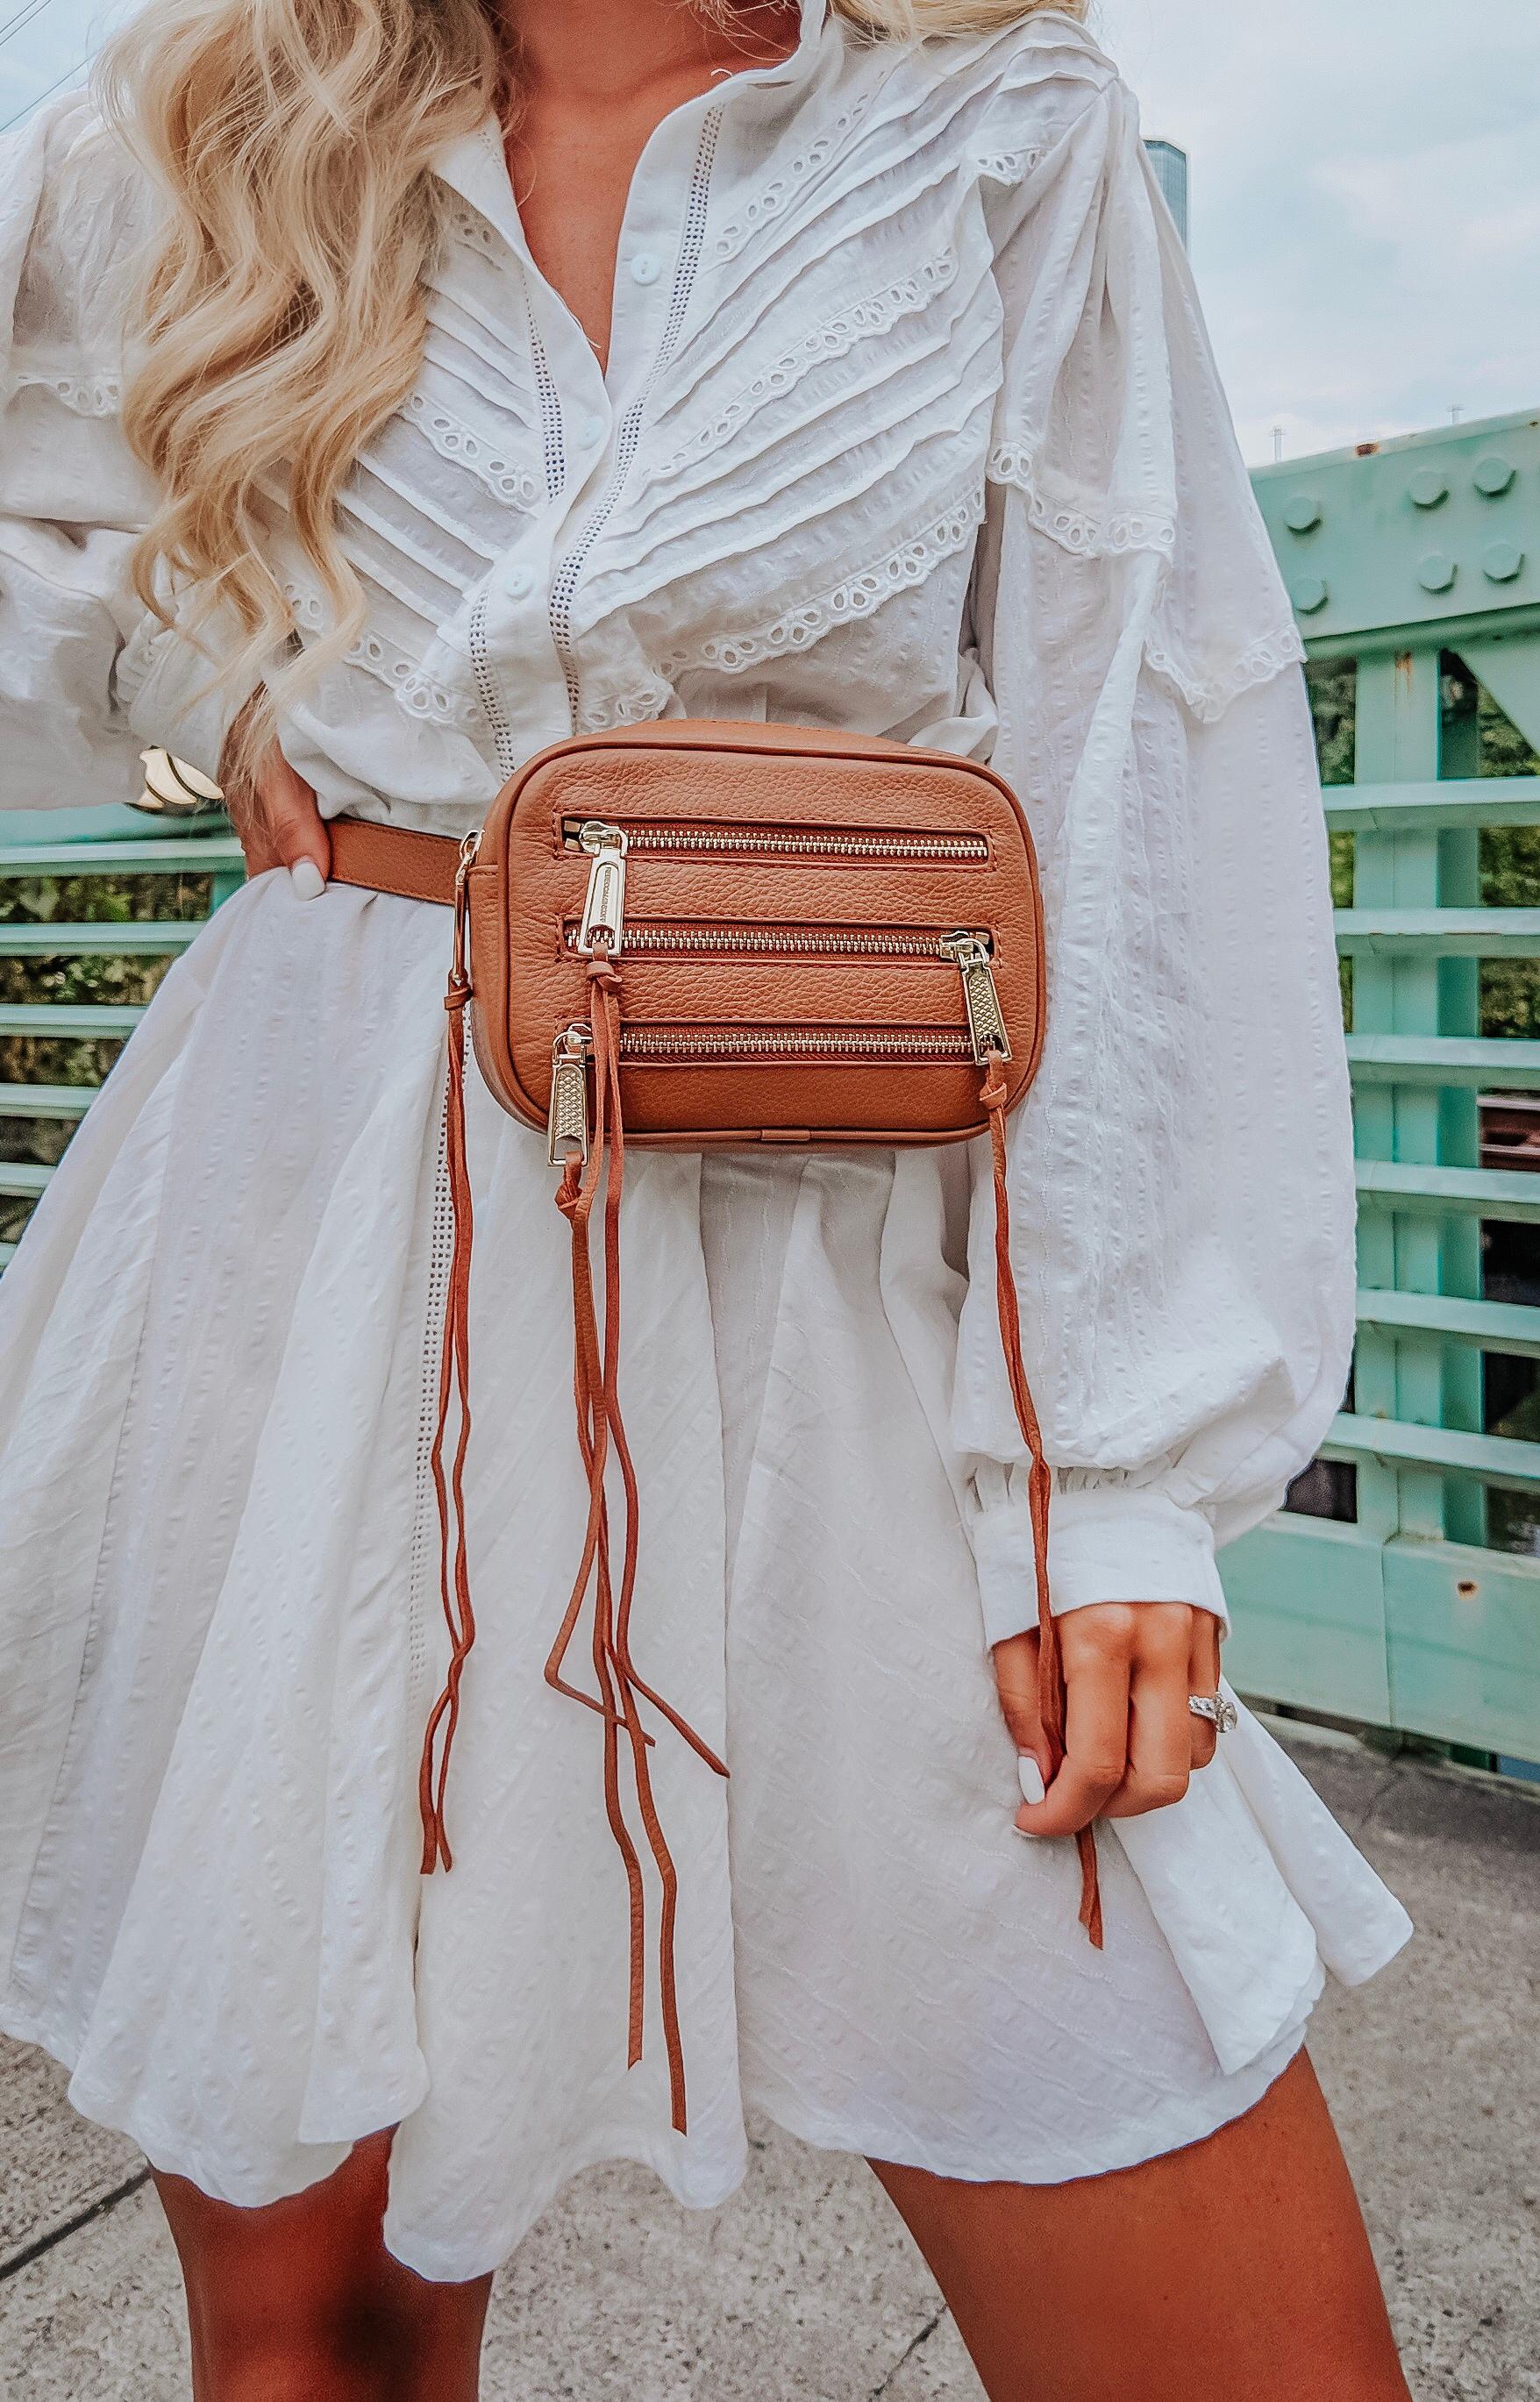 NYFW Handbag Trends with eBay | love 'n' labels www.lovenlabels.com